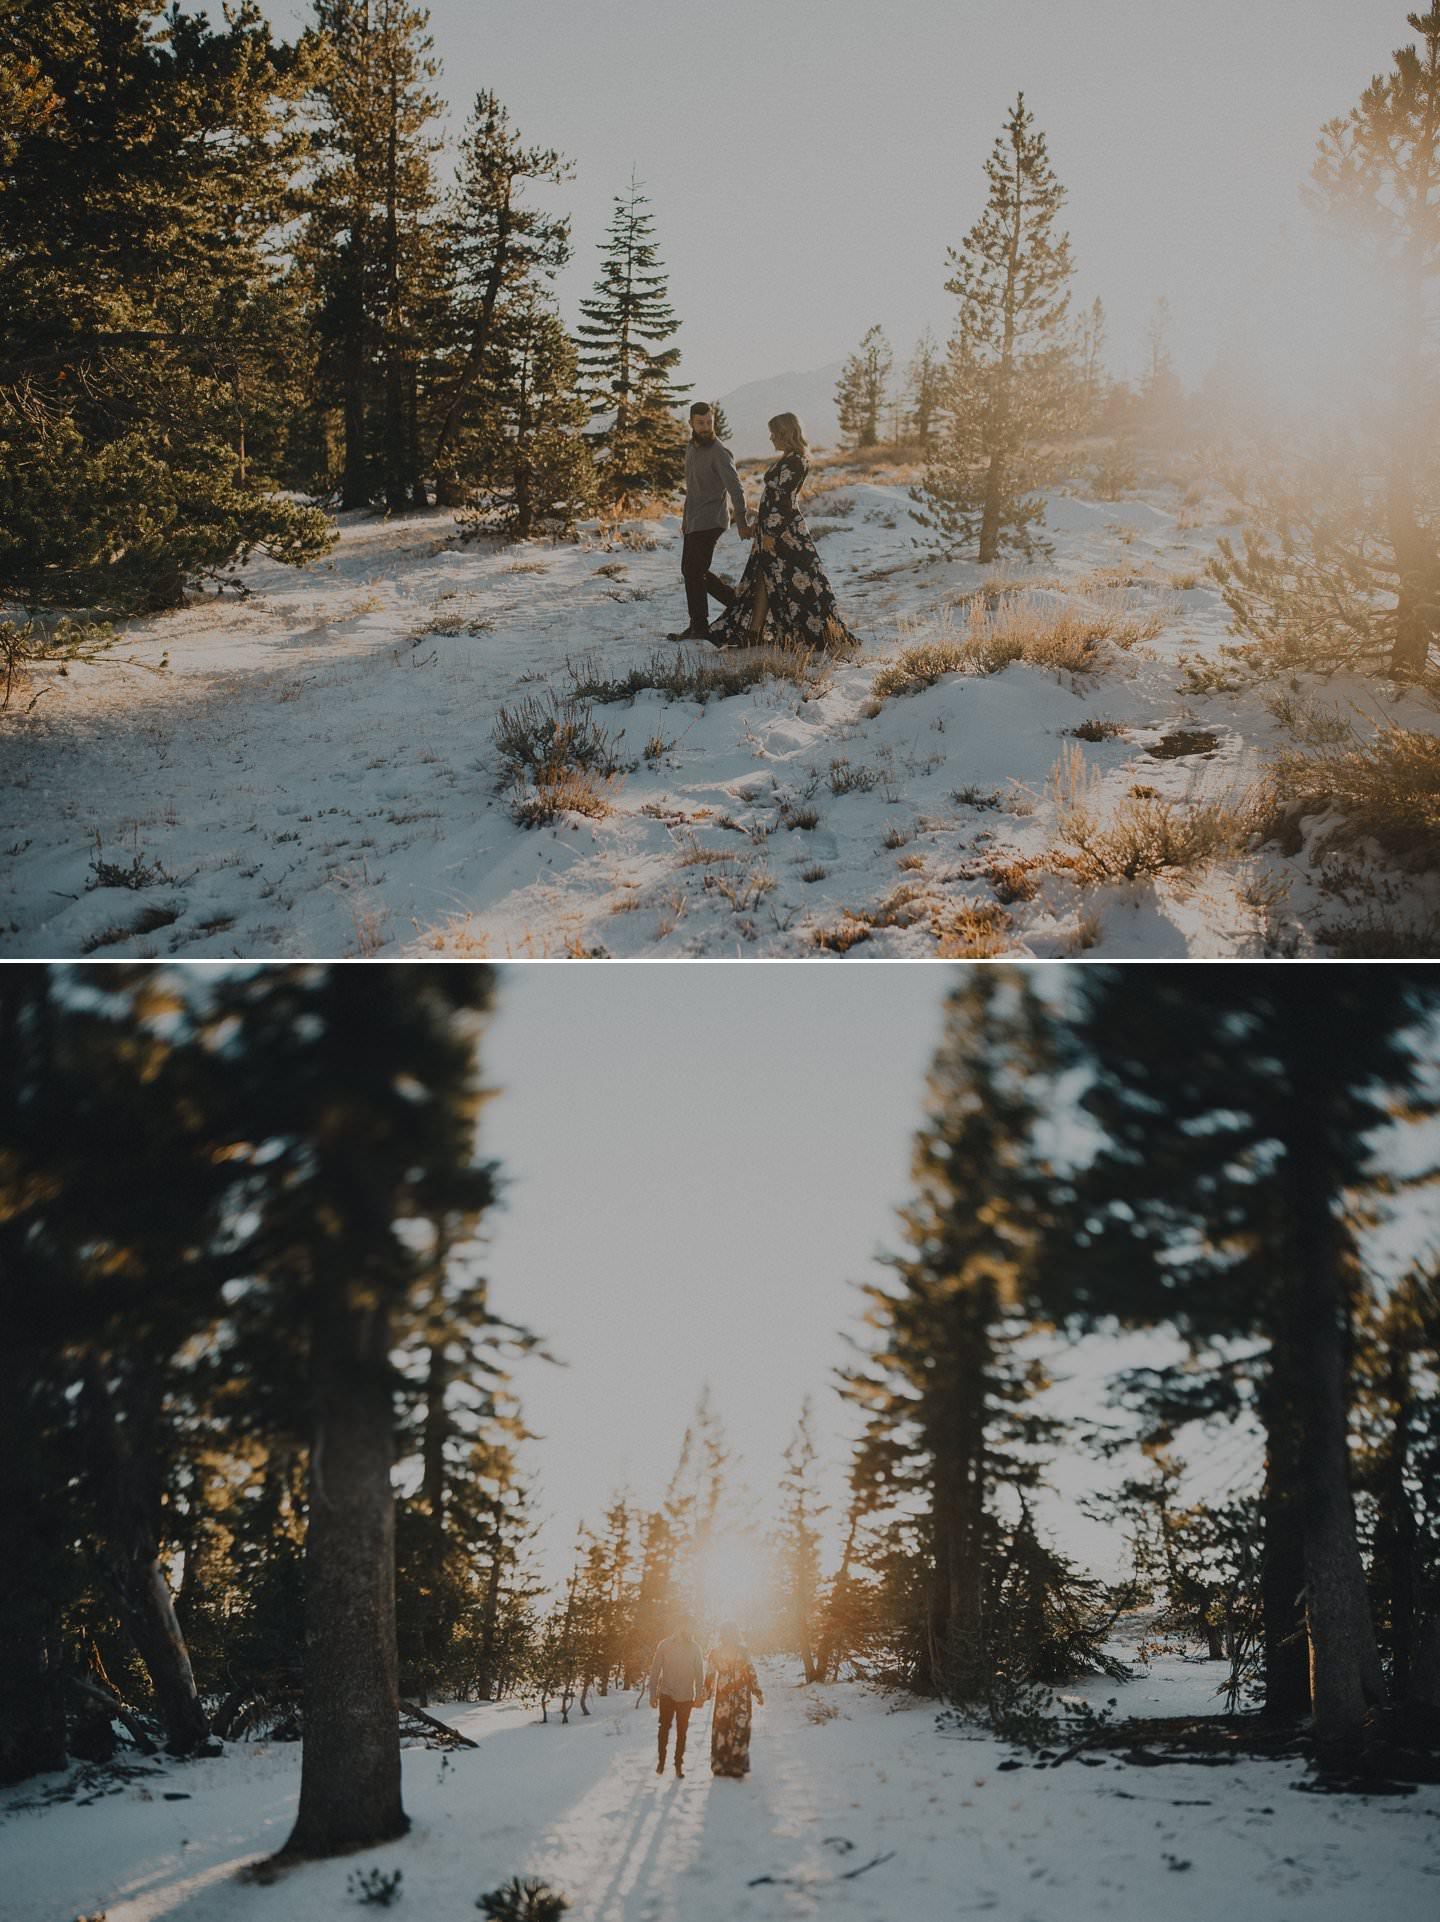 Winter wedding photography ideas.